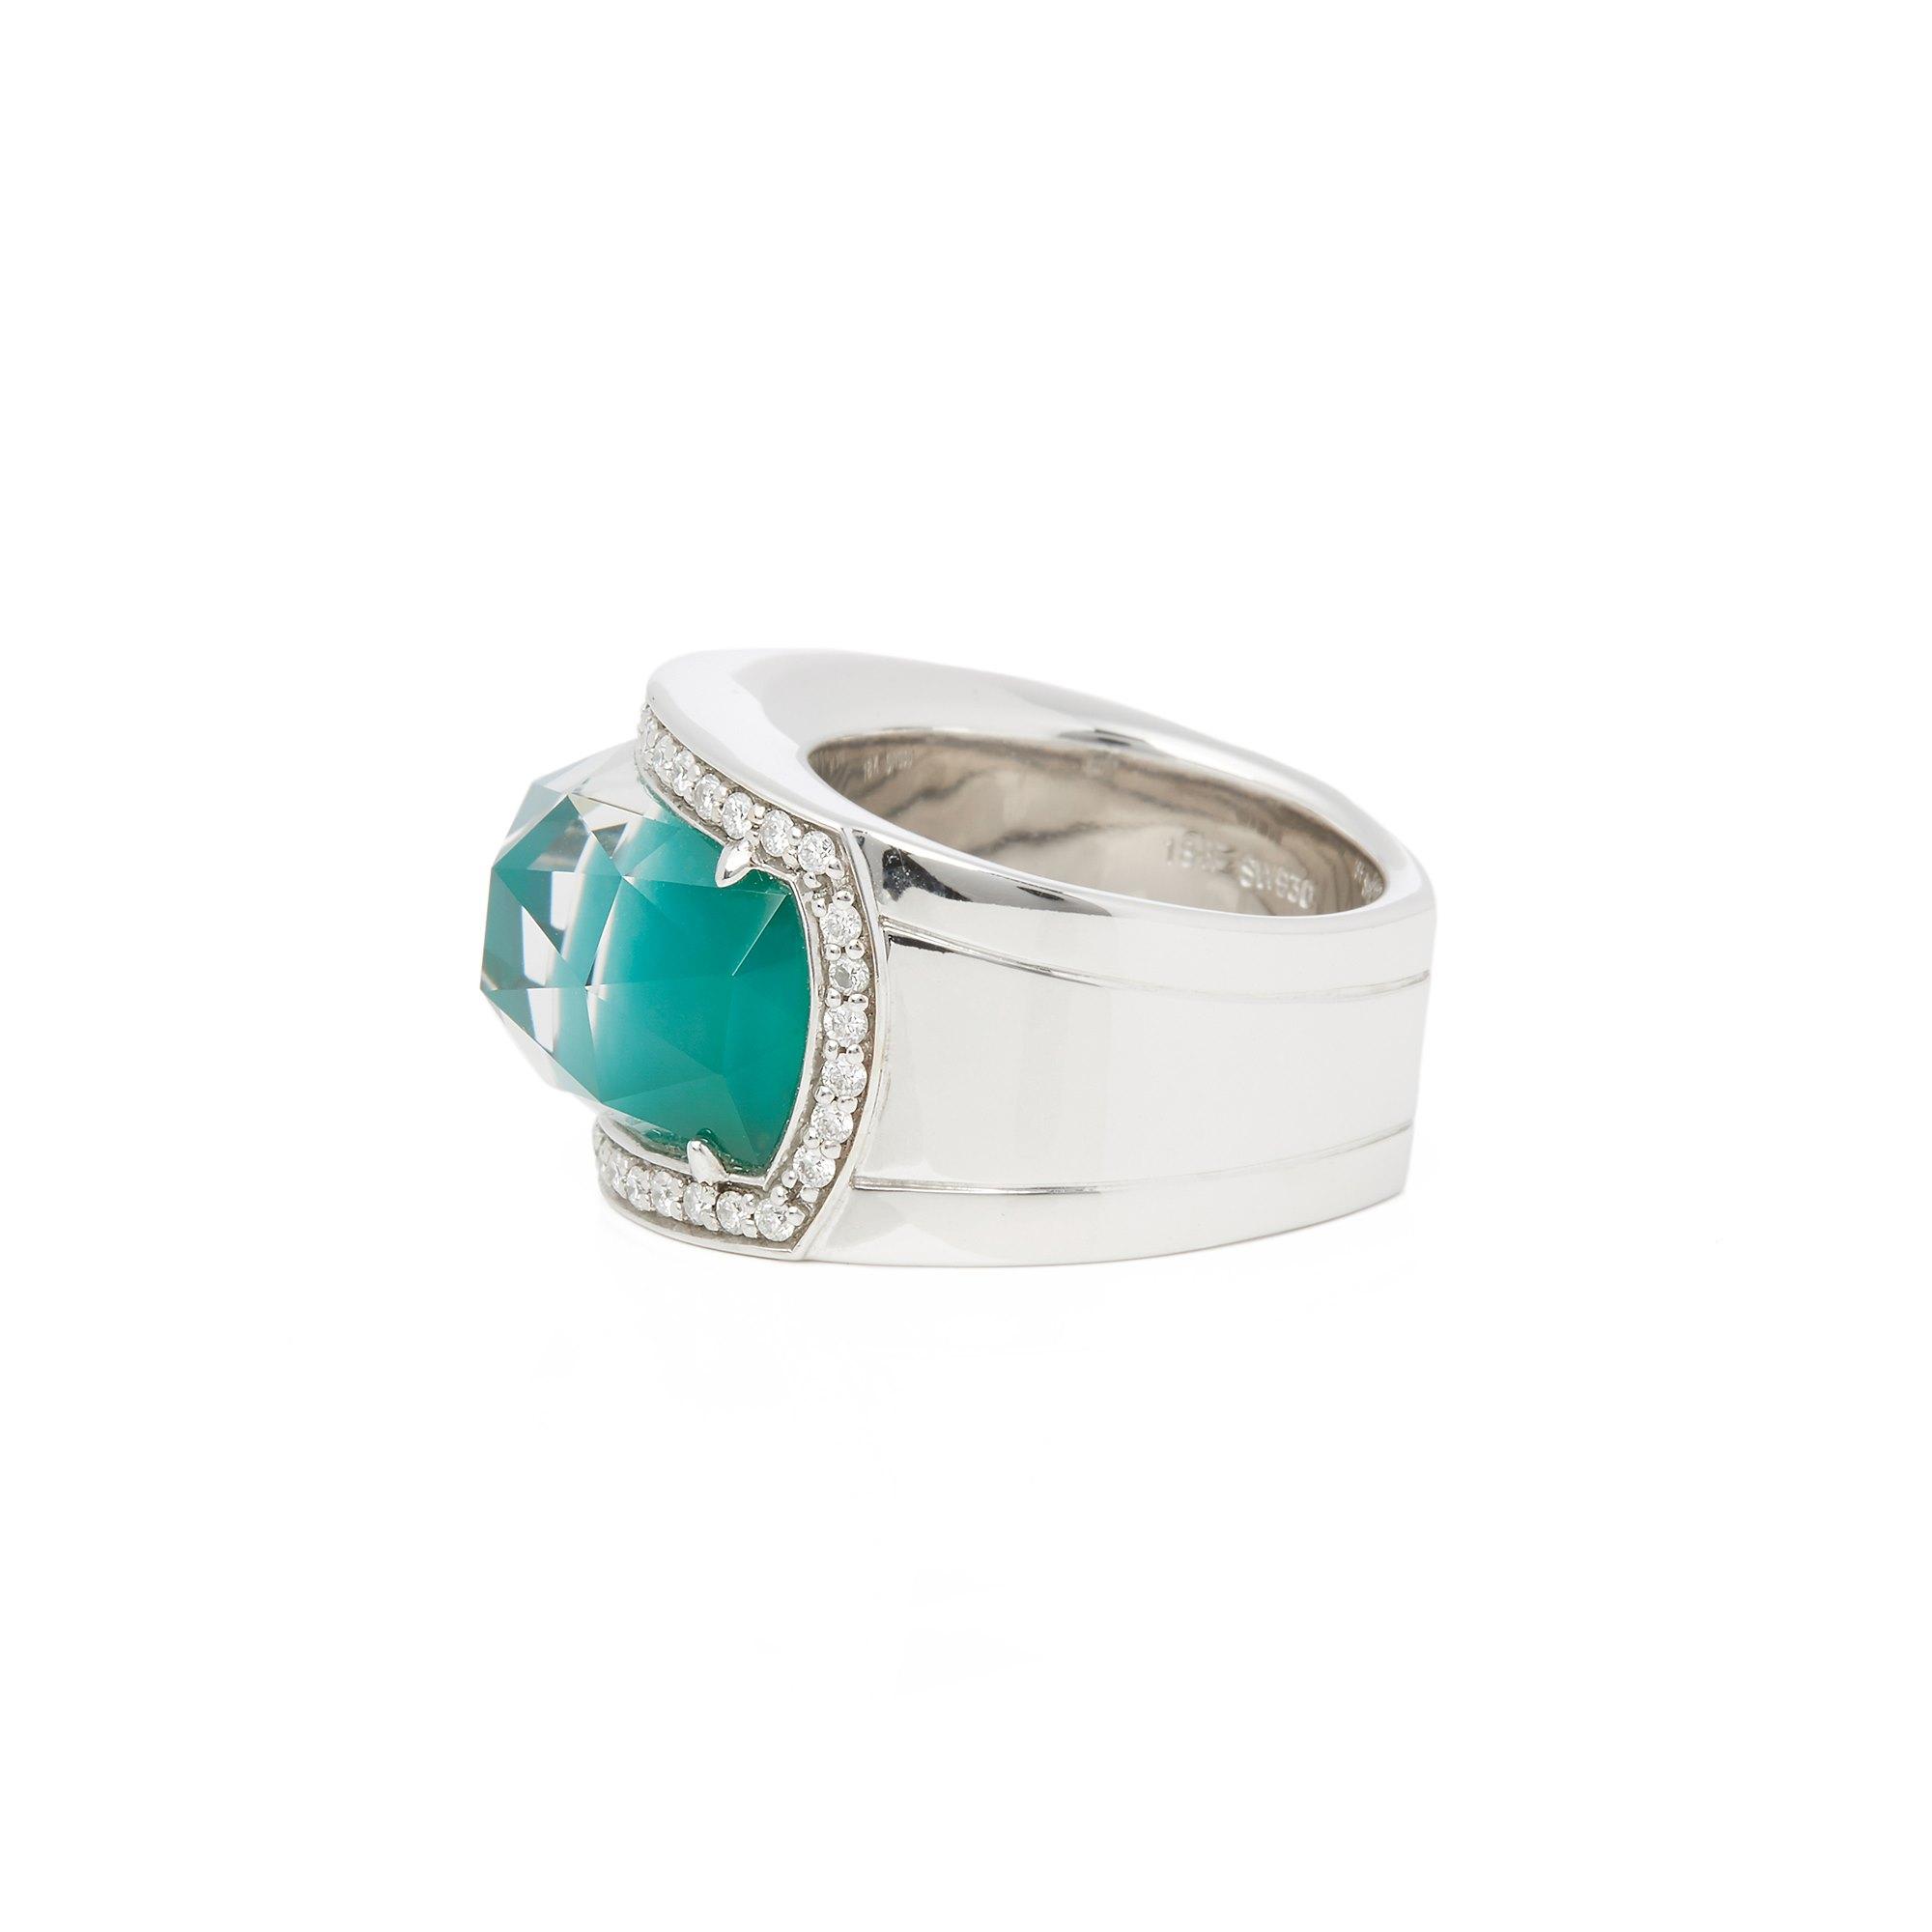 Stephen Webster 18k White Gold Green Agate Crystal Haze Ring